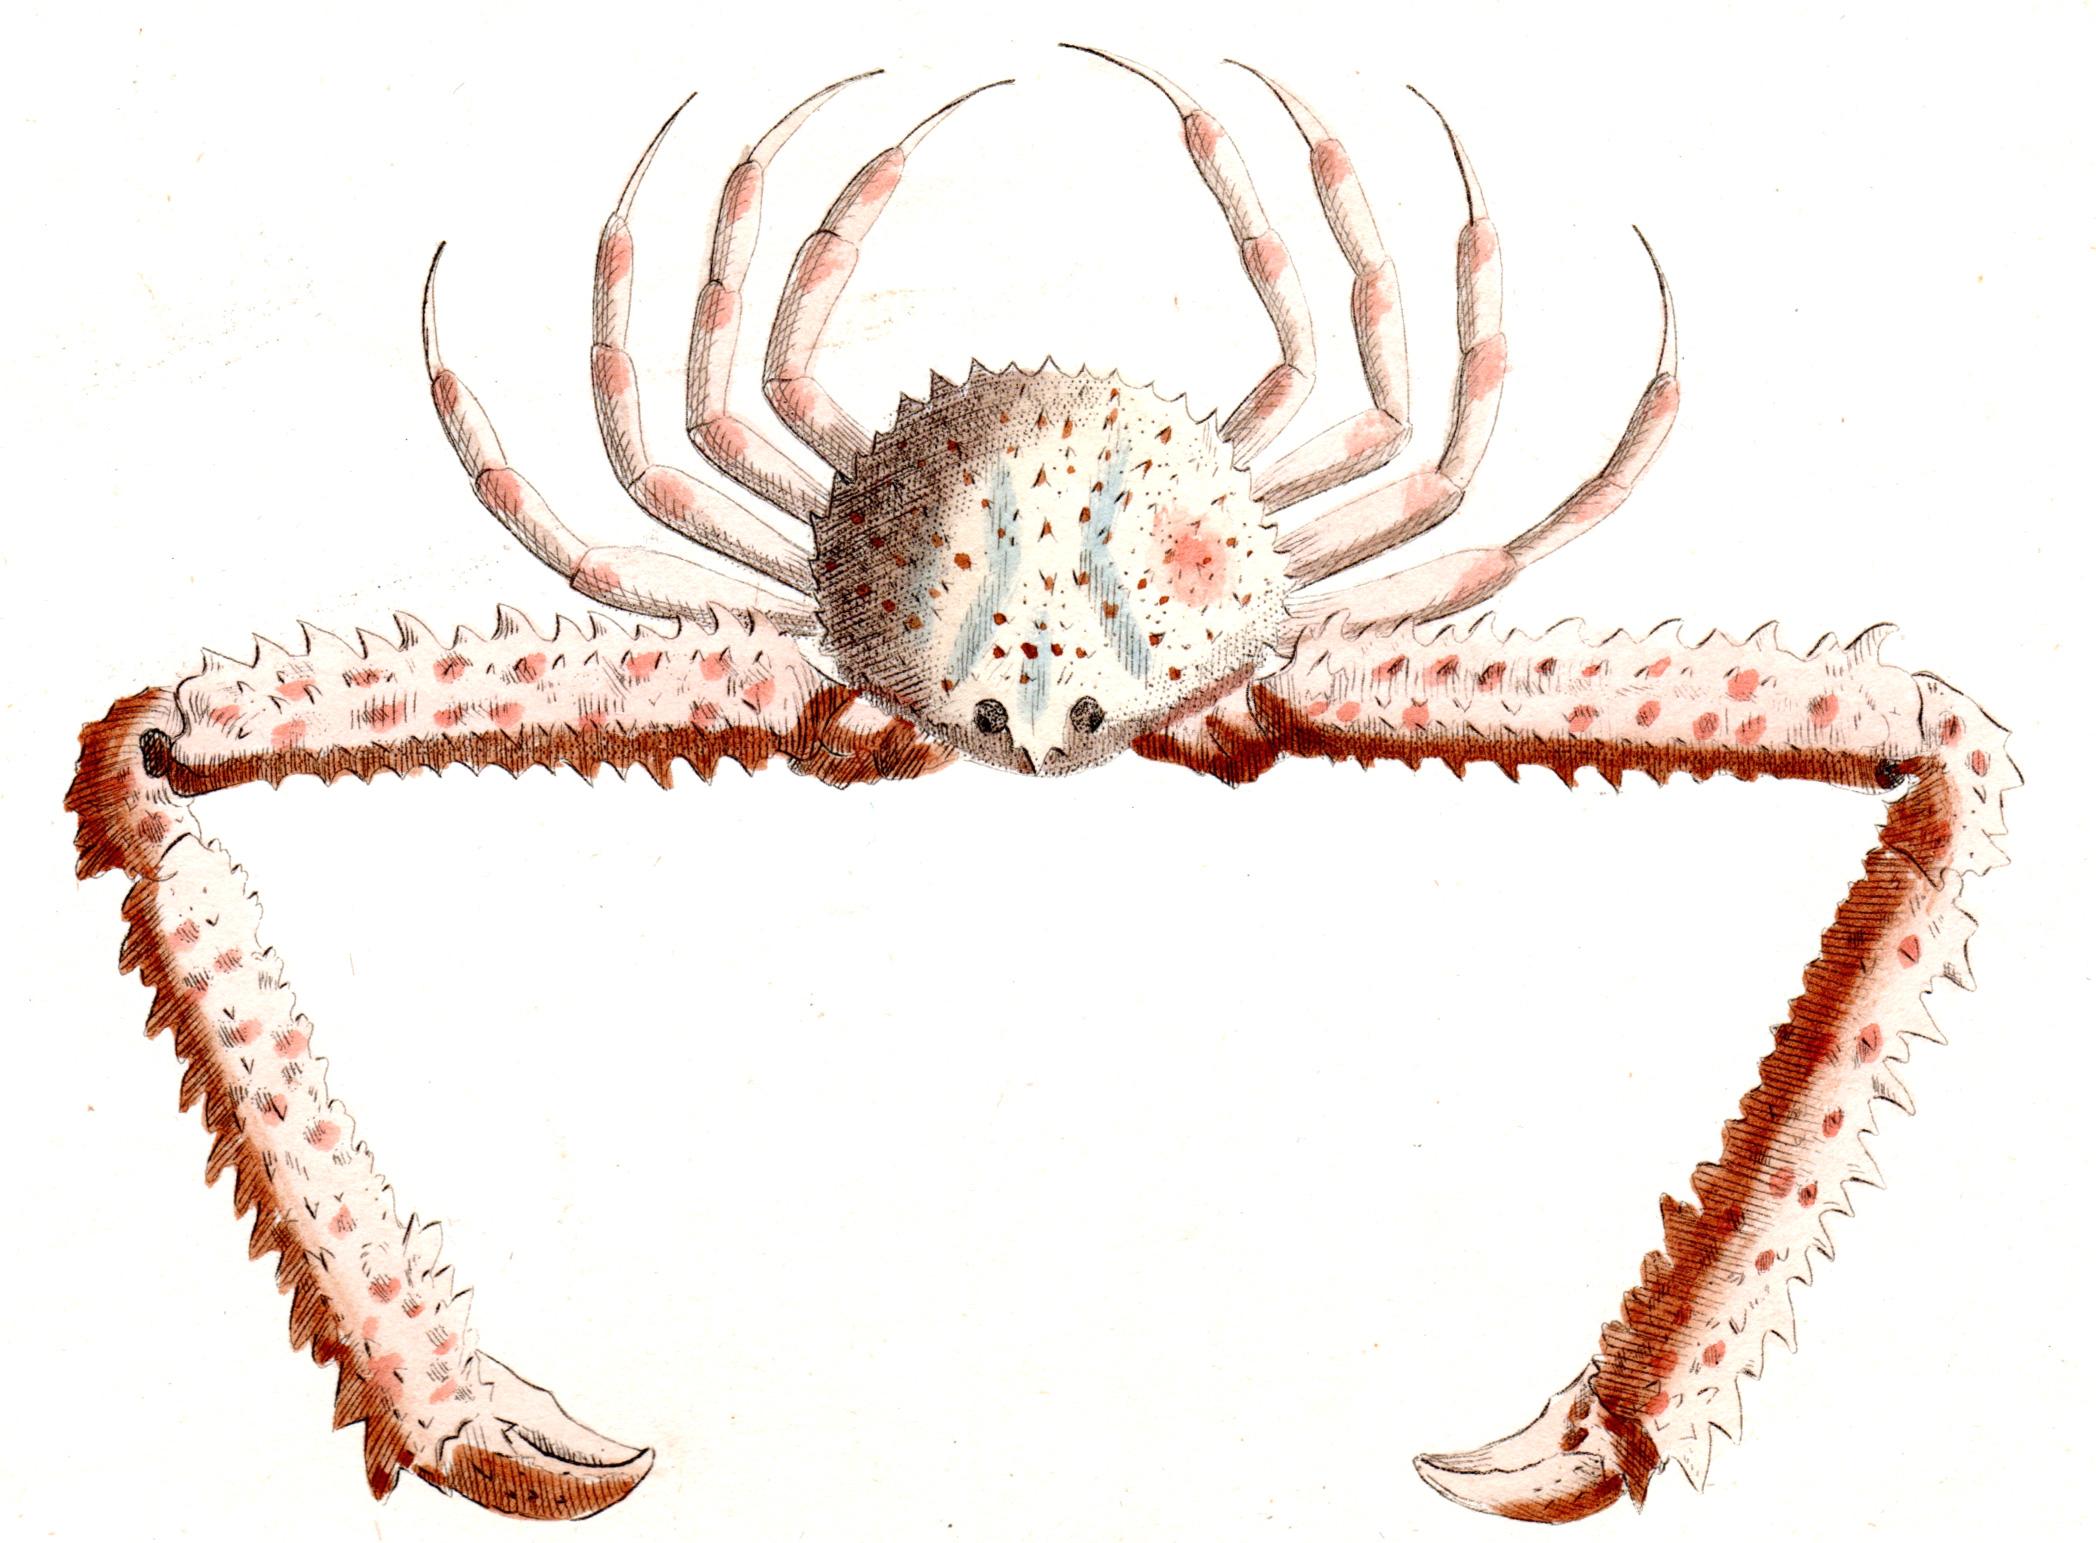 Shaw, George / Nodder, Frederick & Robert P. –Crabs, Shrimp, Lobsters, etc.